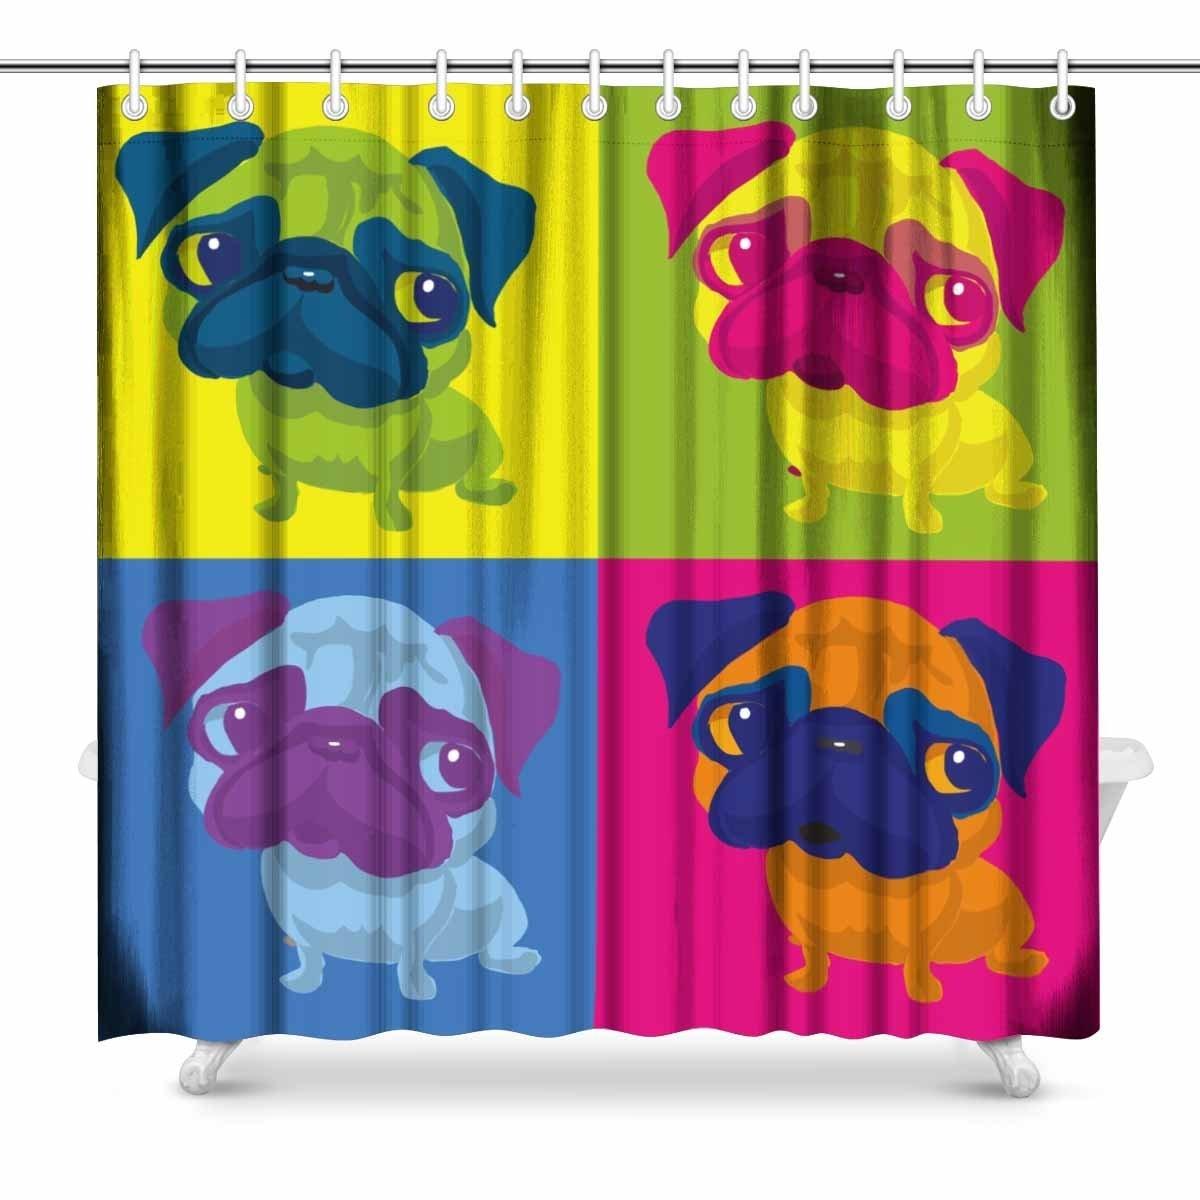 Aplysia Pug Dog Andy Warhol Style Art Decor Print Bathroom Shower Curtain Decorations Fabric 72 Inches